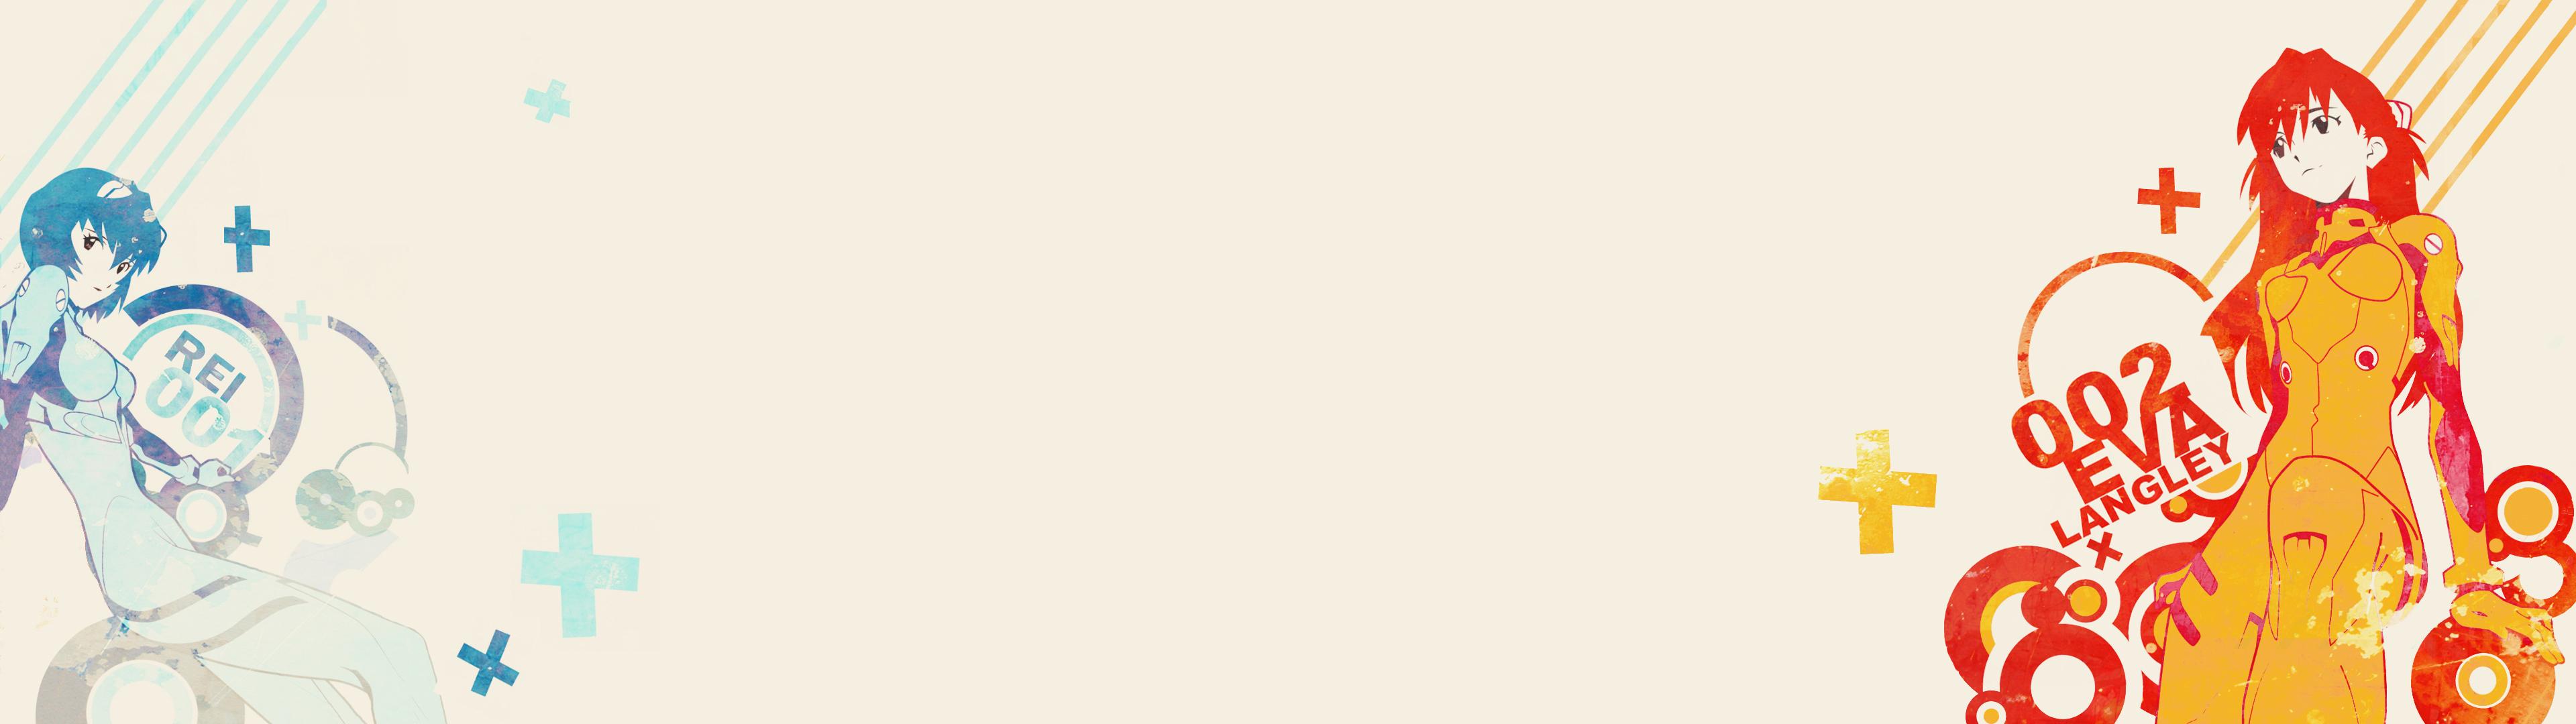 Plain Black Iphone Wallpaper 动漫 Full Hd 壁纸 And 背景 3840x1080 Id 401900